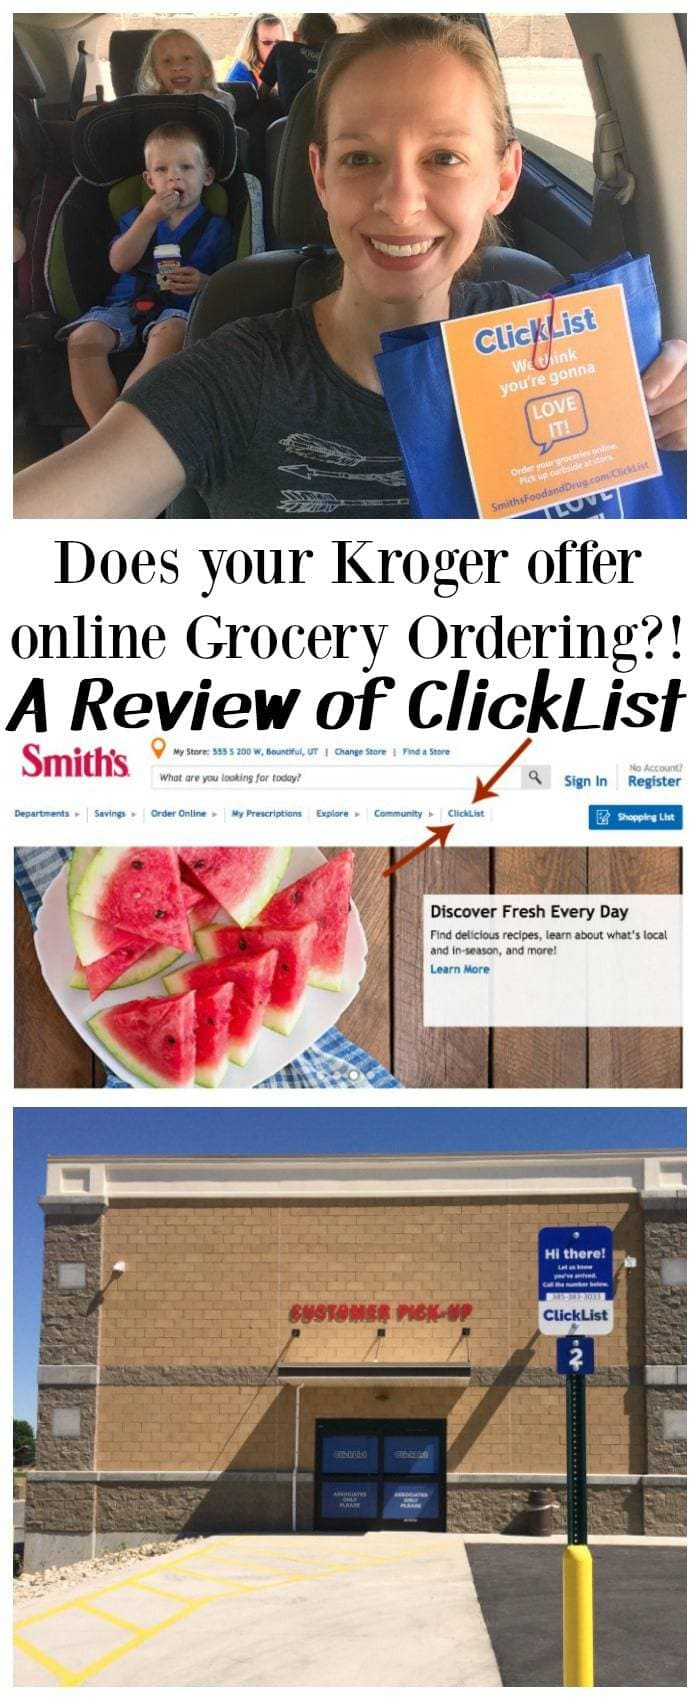 Smith's ClickList Kroger Online Grocery Shopping Utah